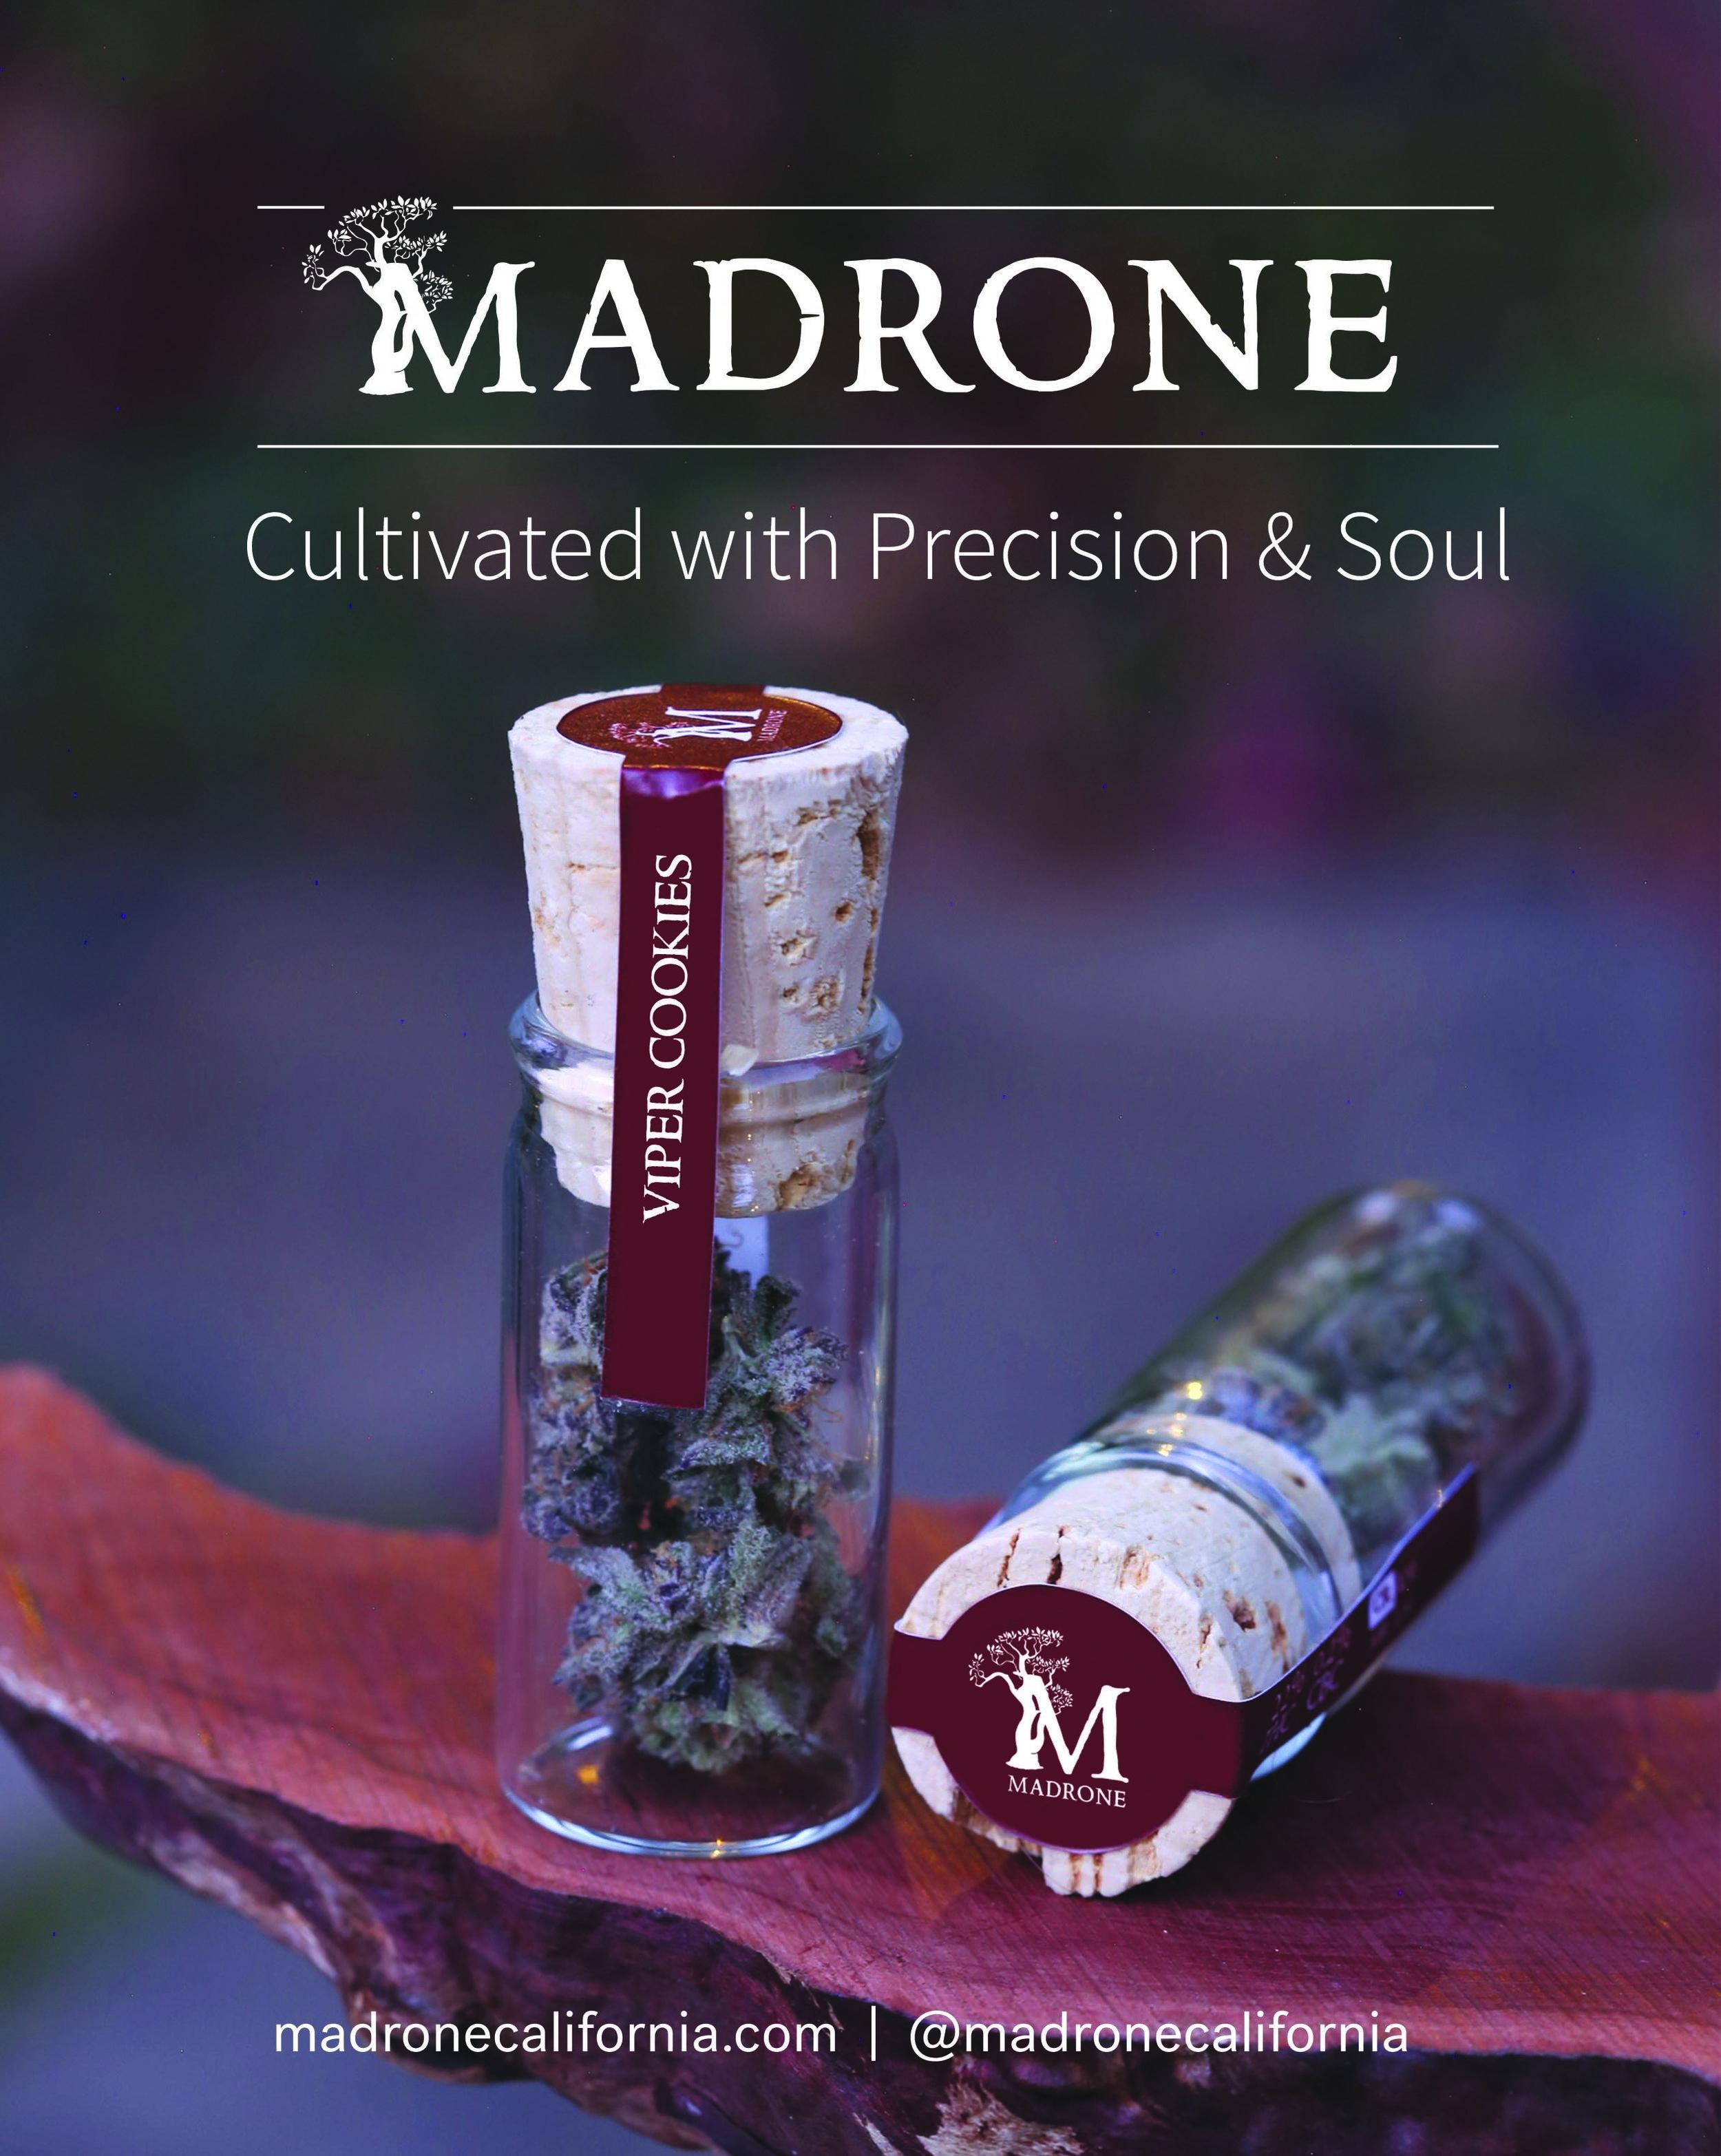 madrone-culture-magazine-ad.jpg